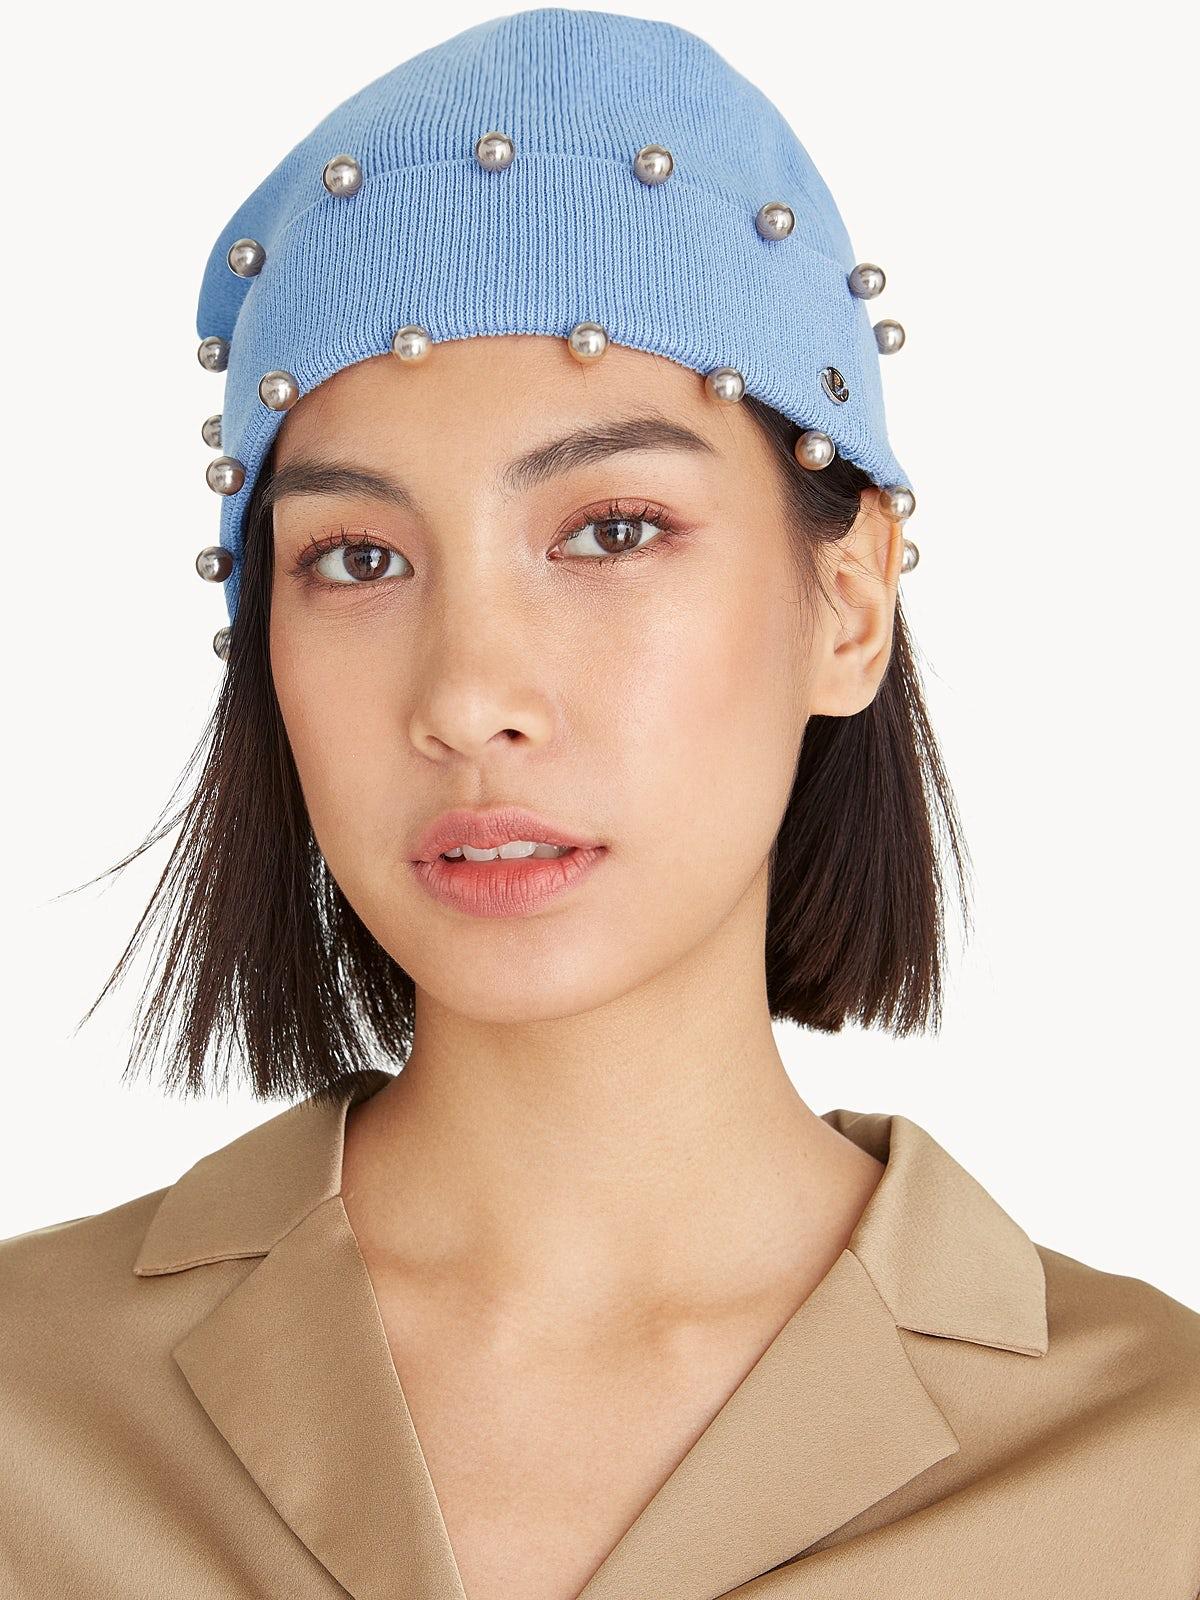 80b6b41ea3a31 Hats And Hair - Pomelo Thailand